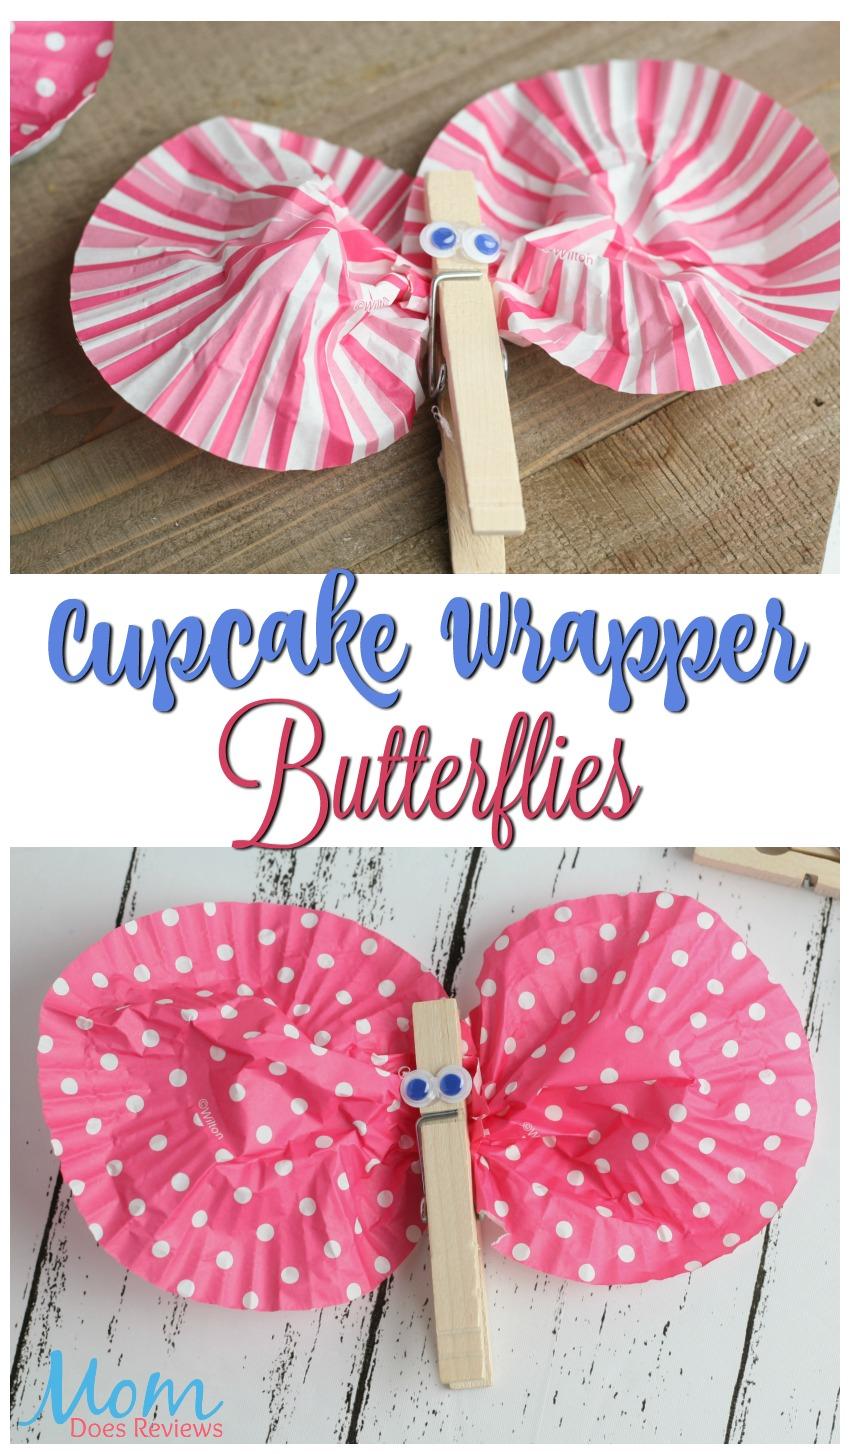 Cupcake Wrapper Butterflies #crafts #spring #butterfly #diy #easycraft